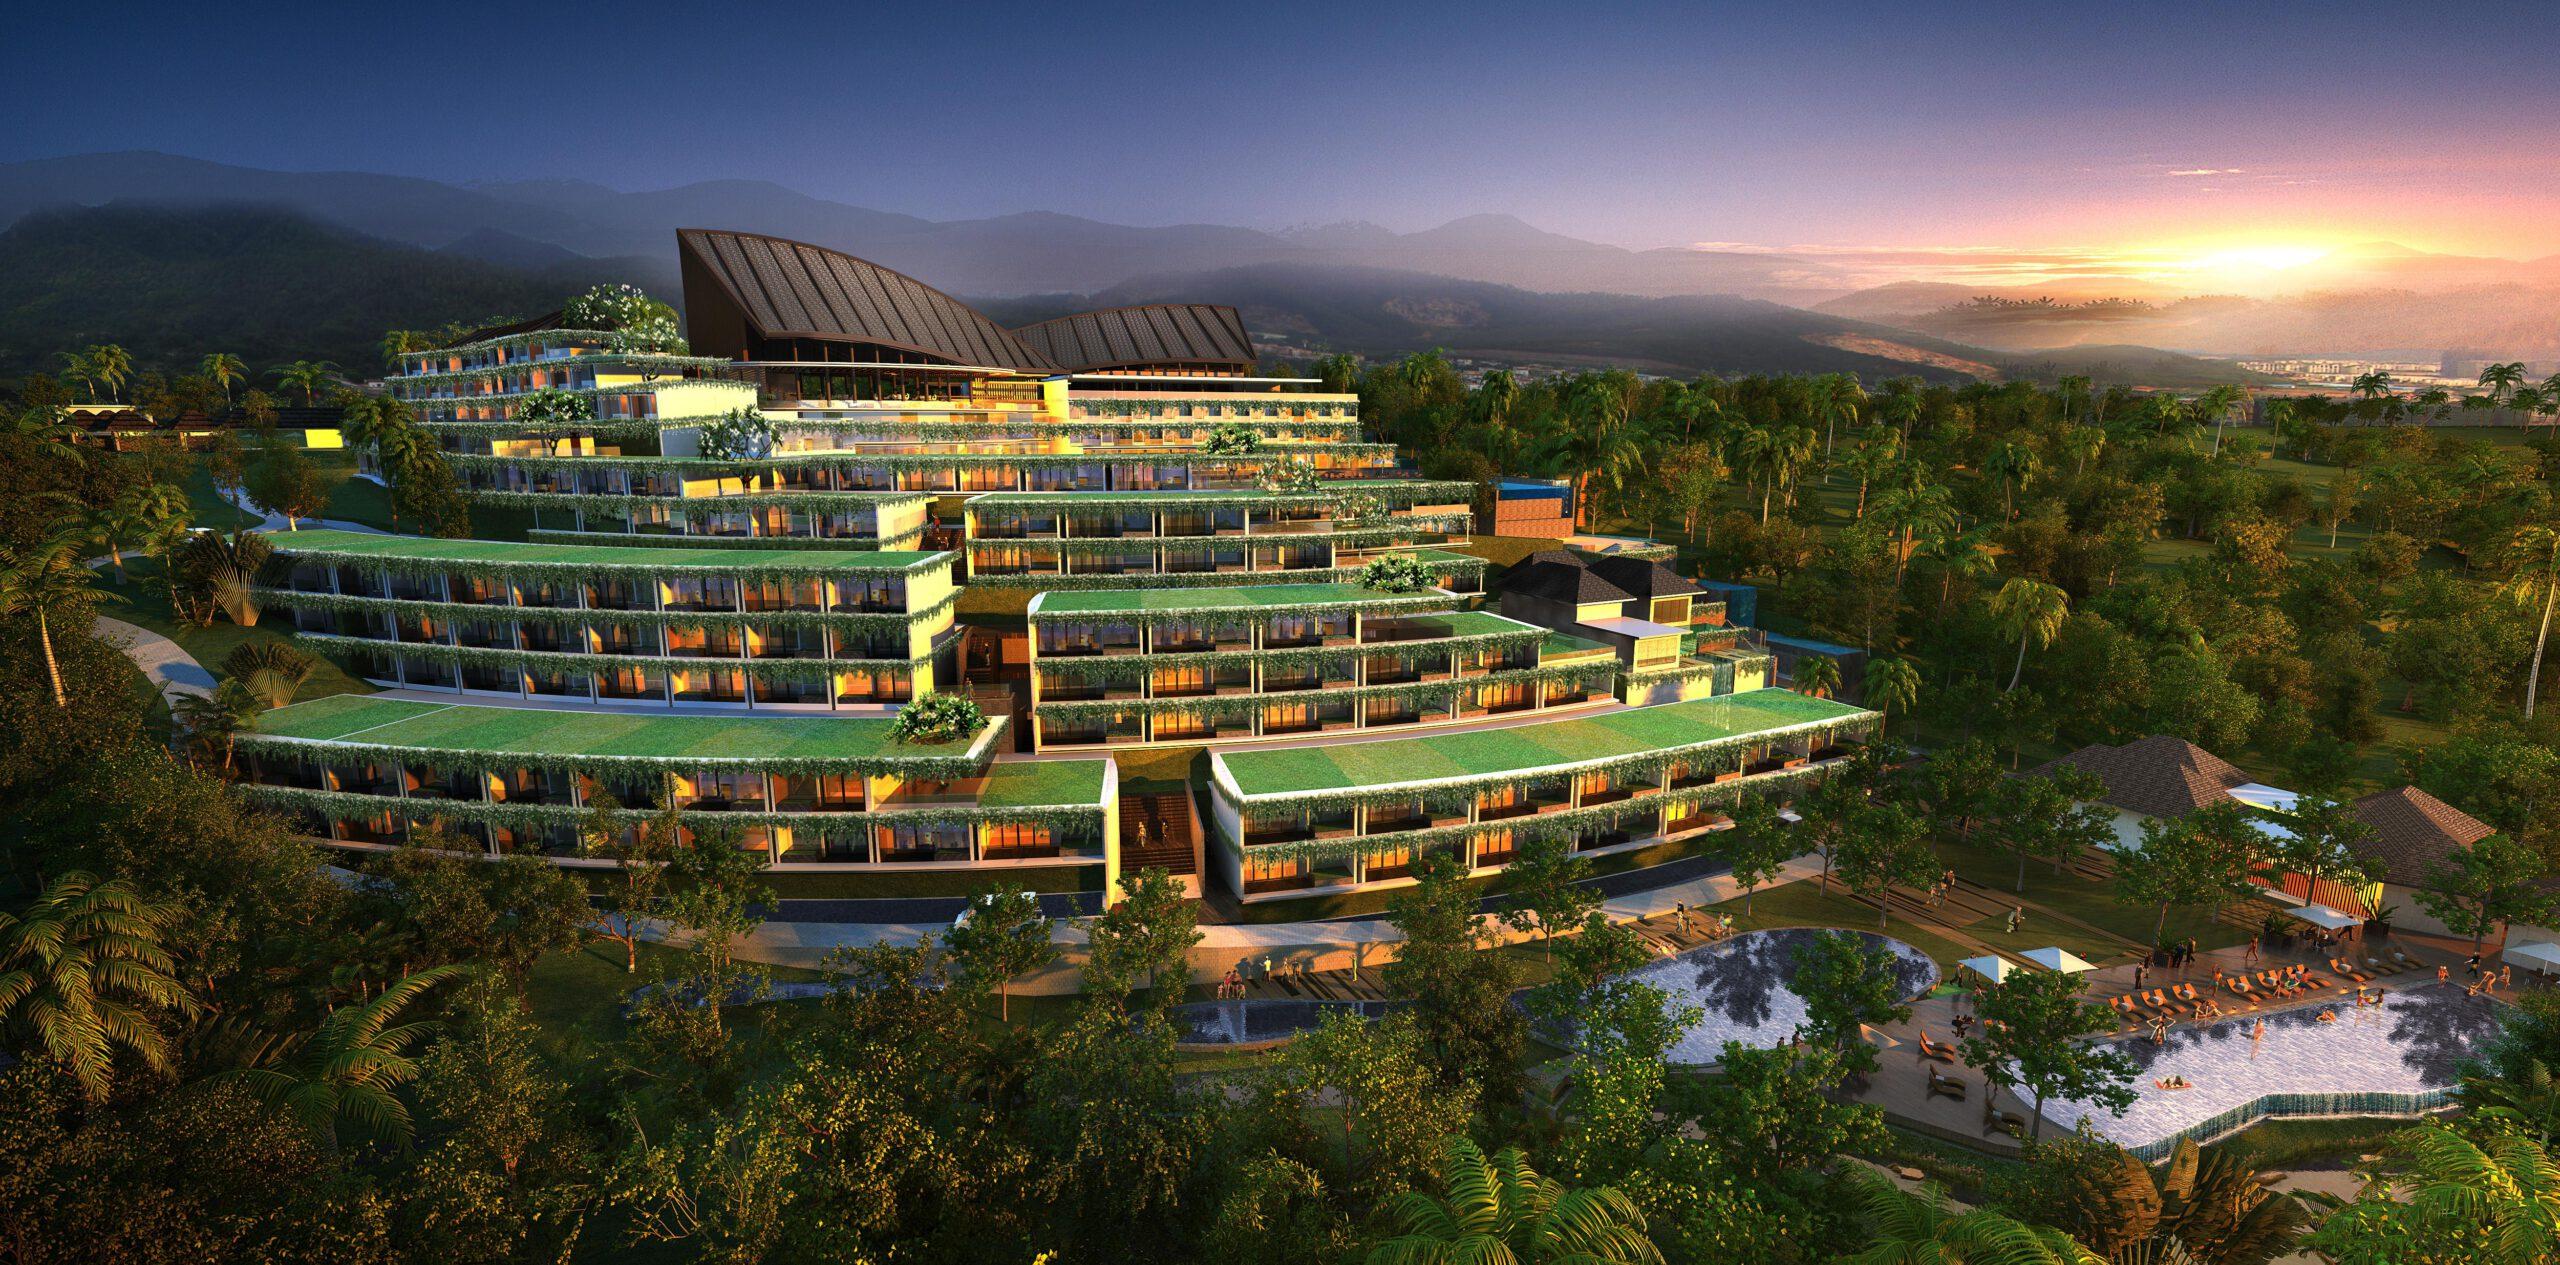 https://www.otdesign.com/wp-content/uploads/2021/04/renaissance-bali-uluwatu-resort-spa-photo16-scaled.jpg